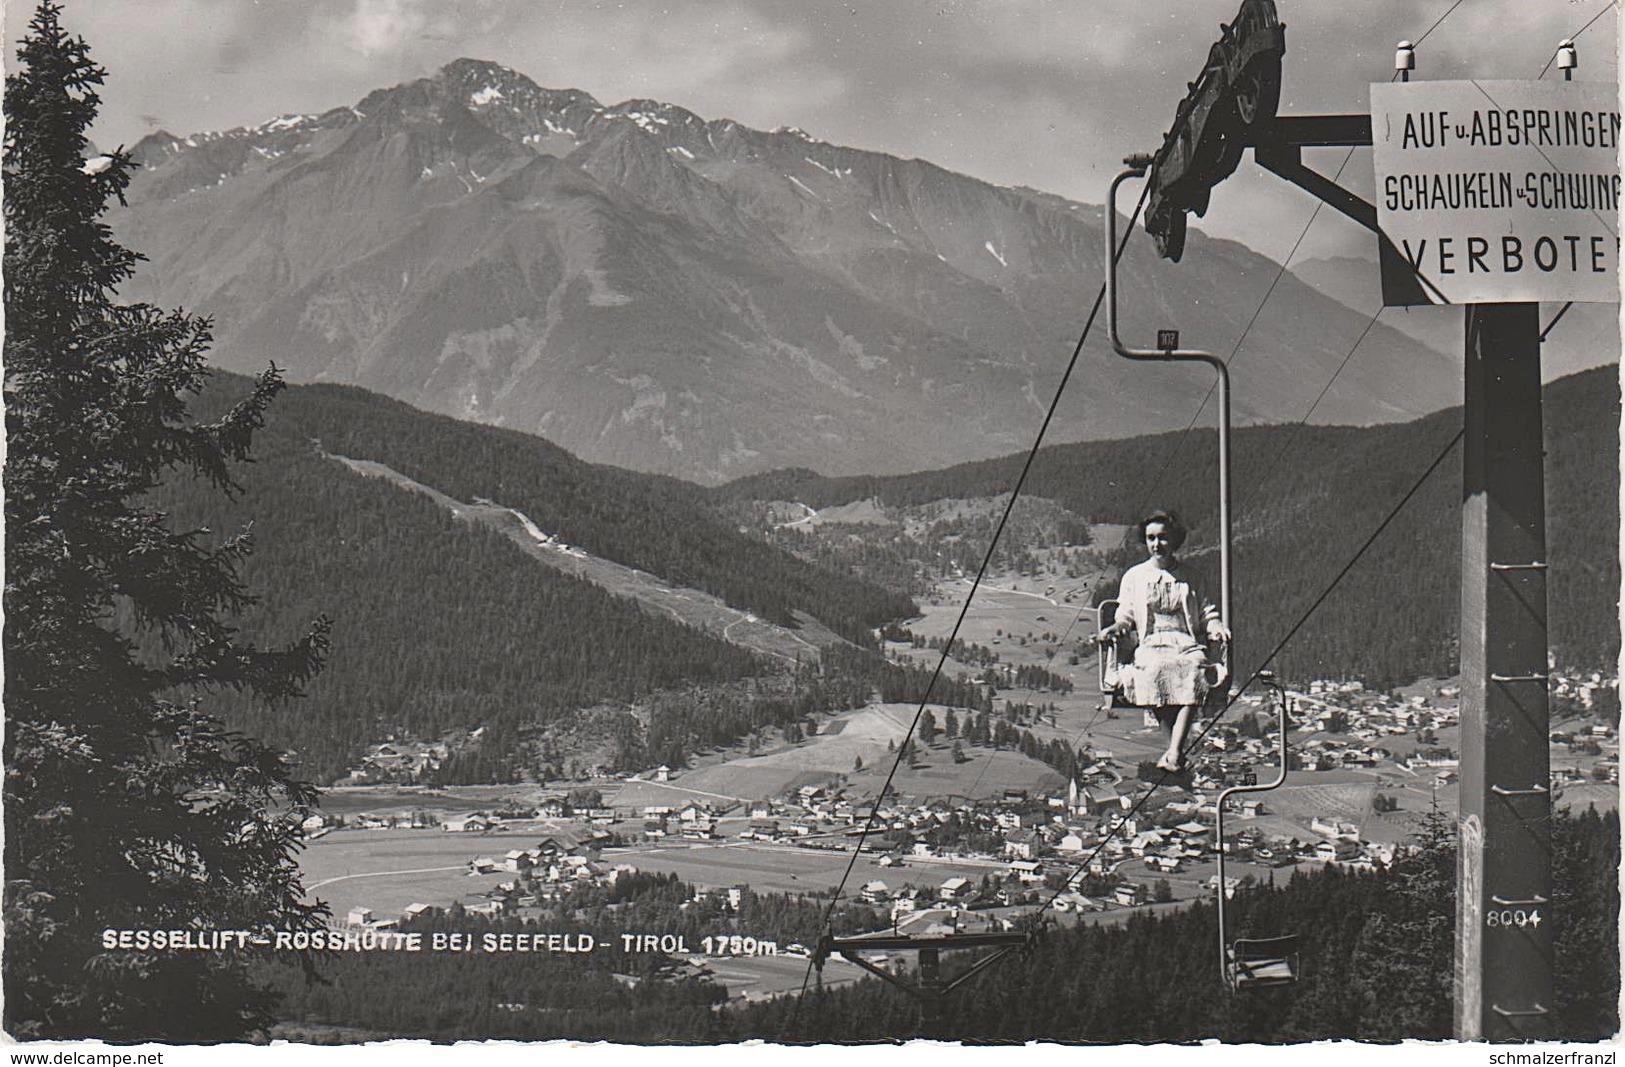 AK Seefeld Sessellift Roßhütte Innsbruck Scharnitz Leutasch Zirl Reith Mittenwald Auland Telfs Tirol Österreich Austria - Seefeld